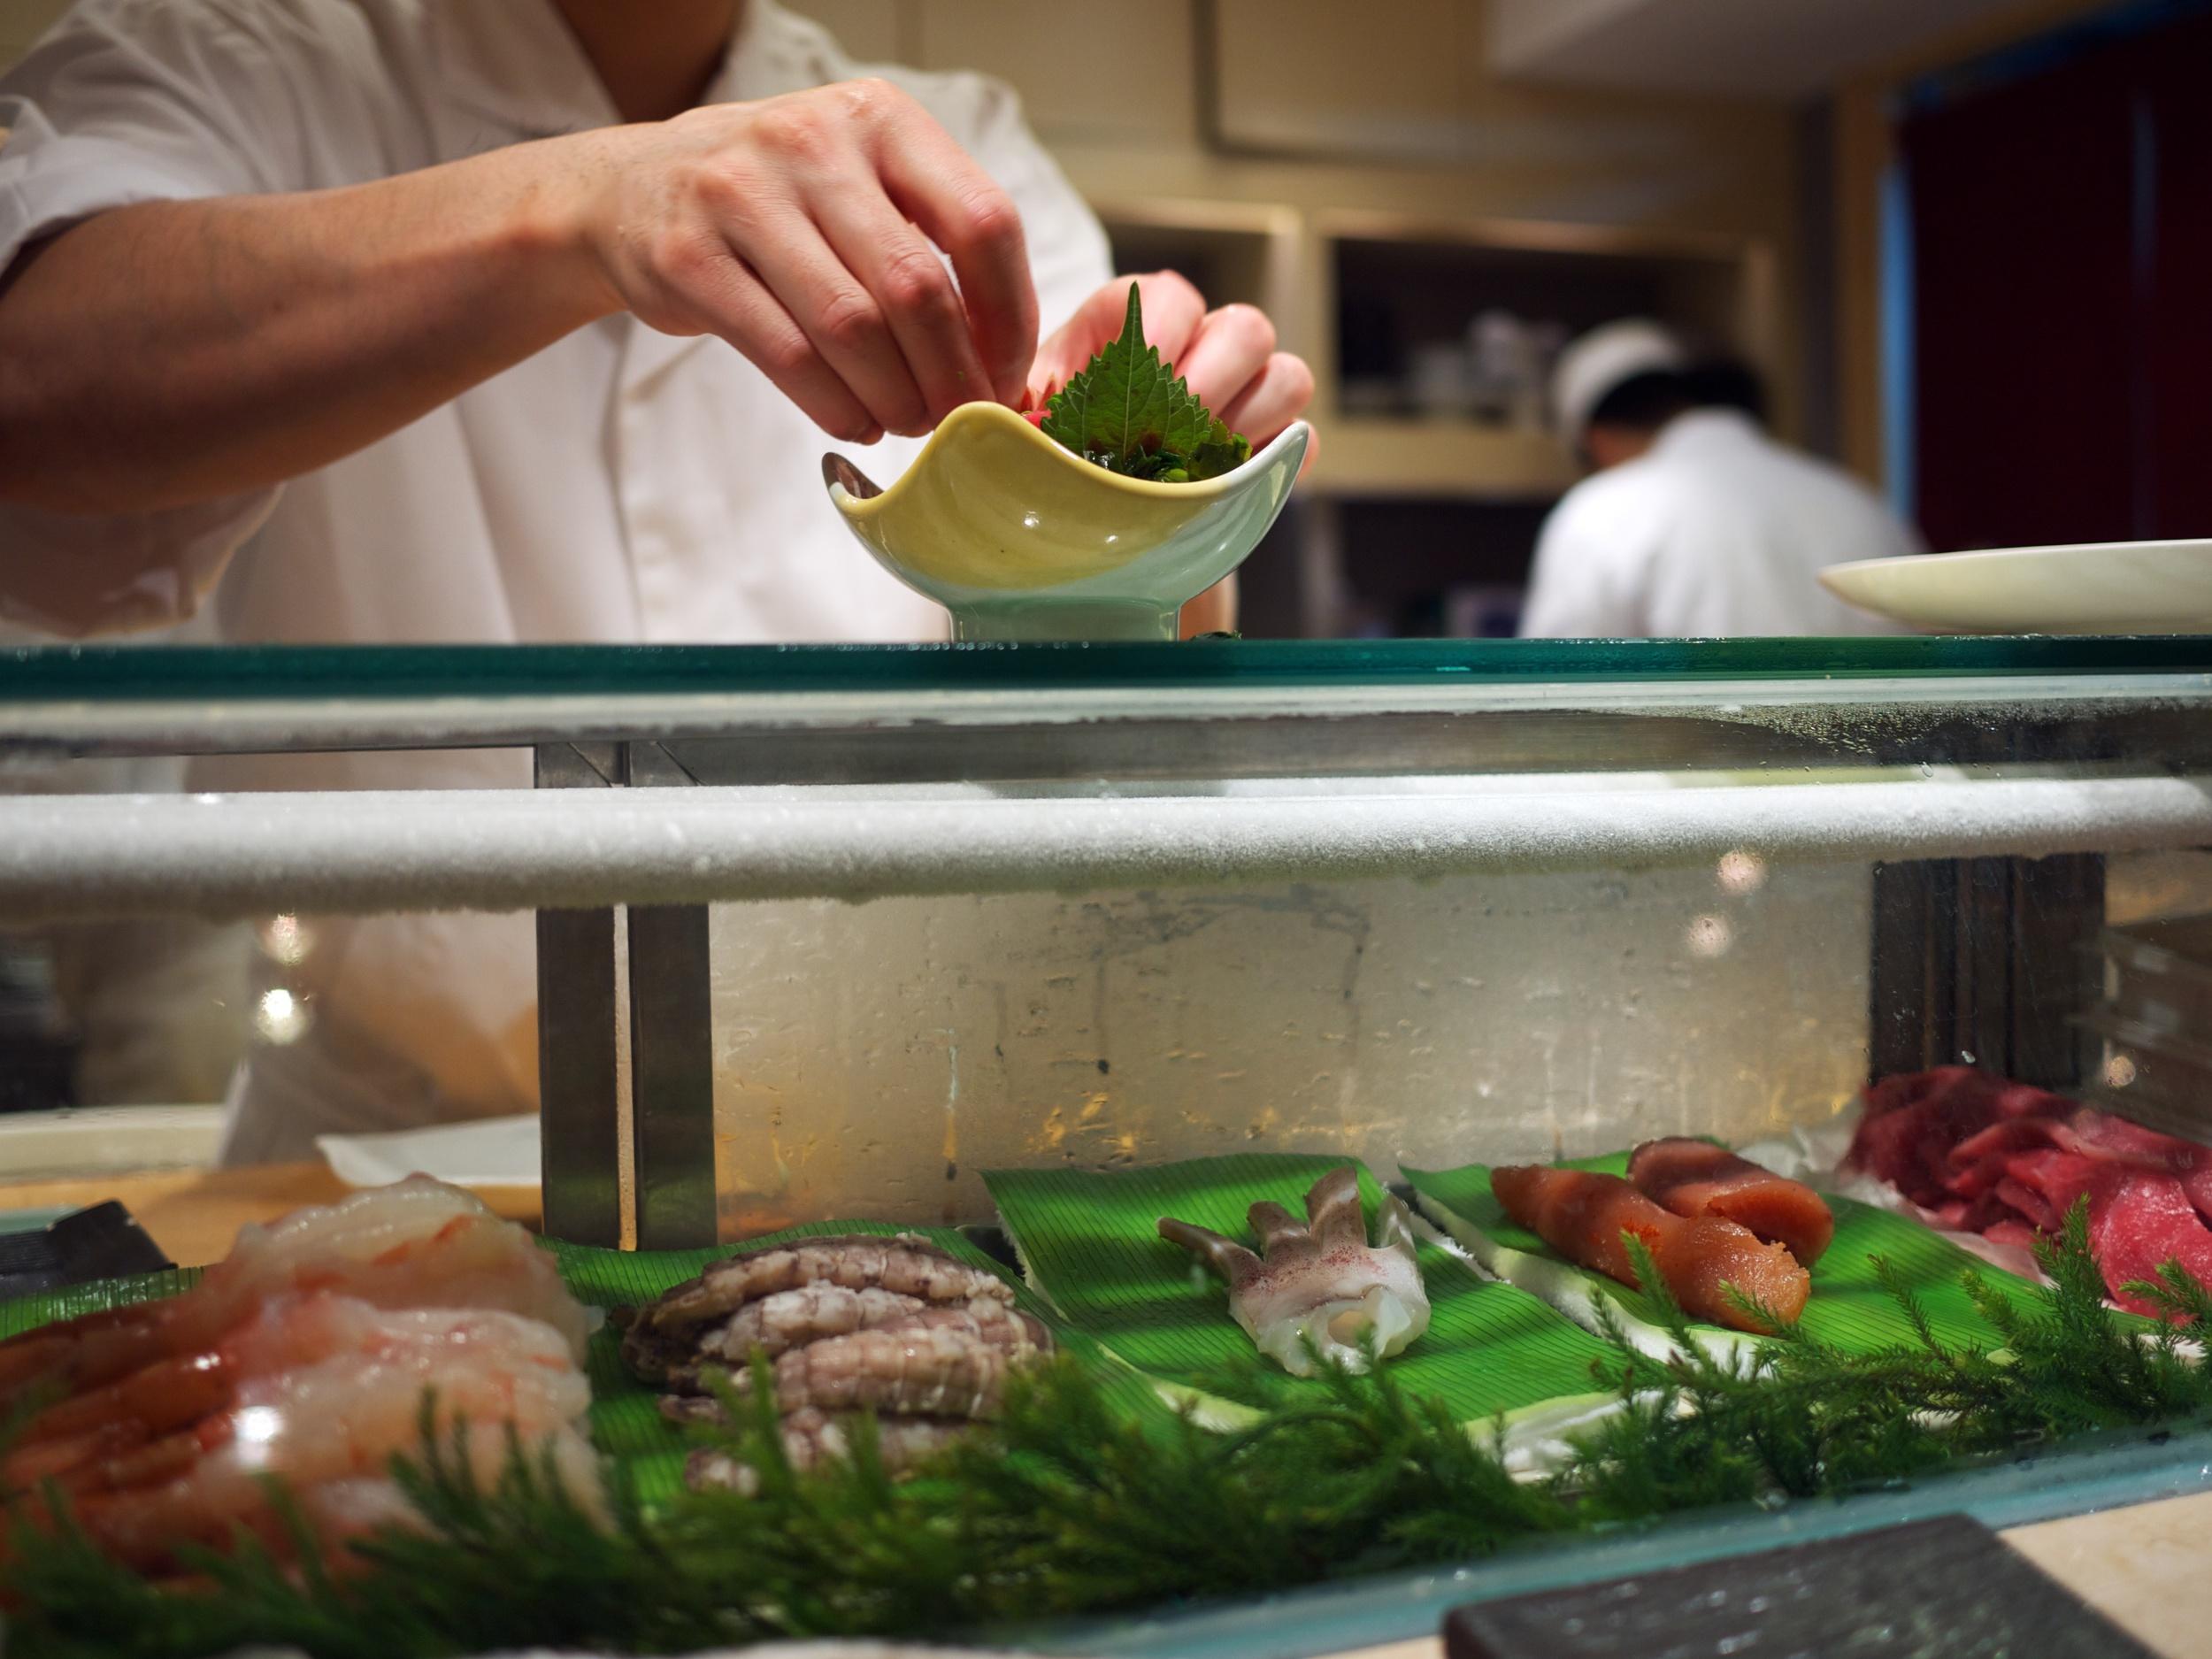 FOOD-SushiShin_2011-09-04_12-22-53_P1040263_©JosephLinaschke2011.jpg